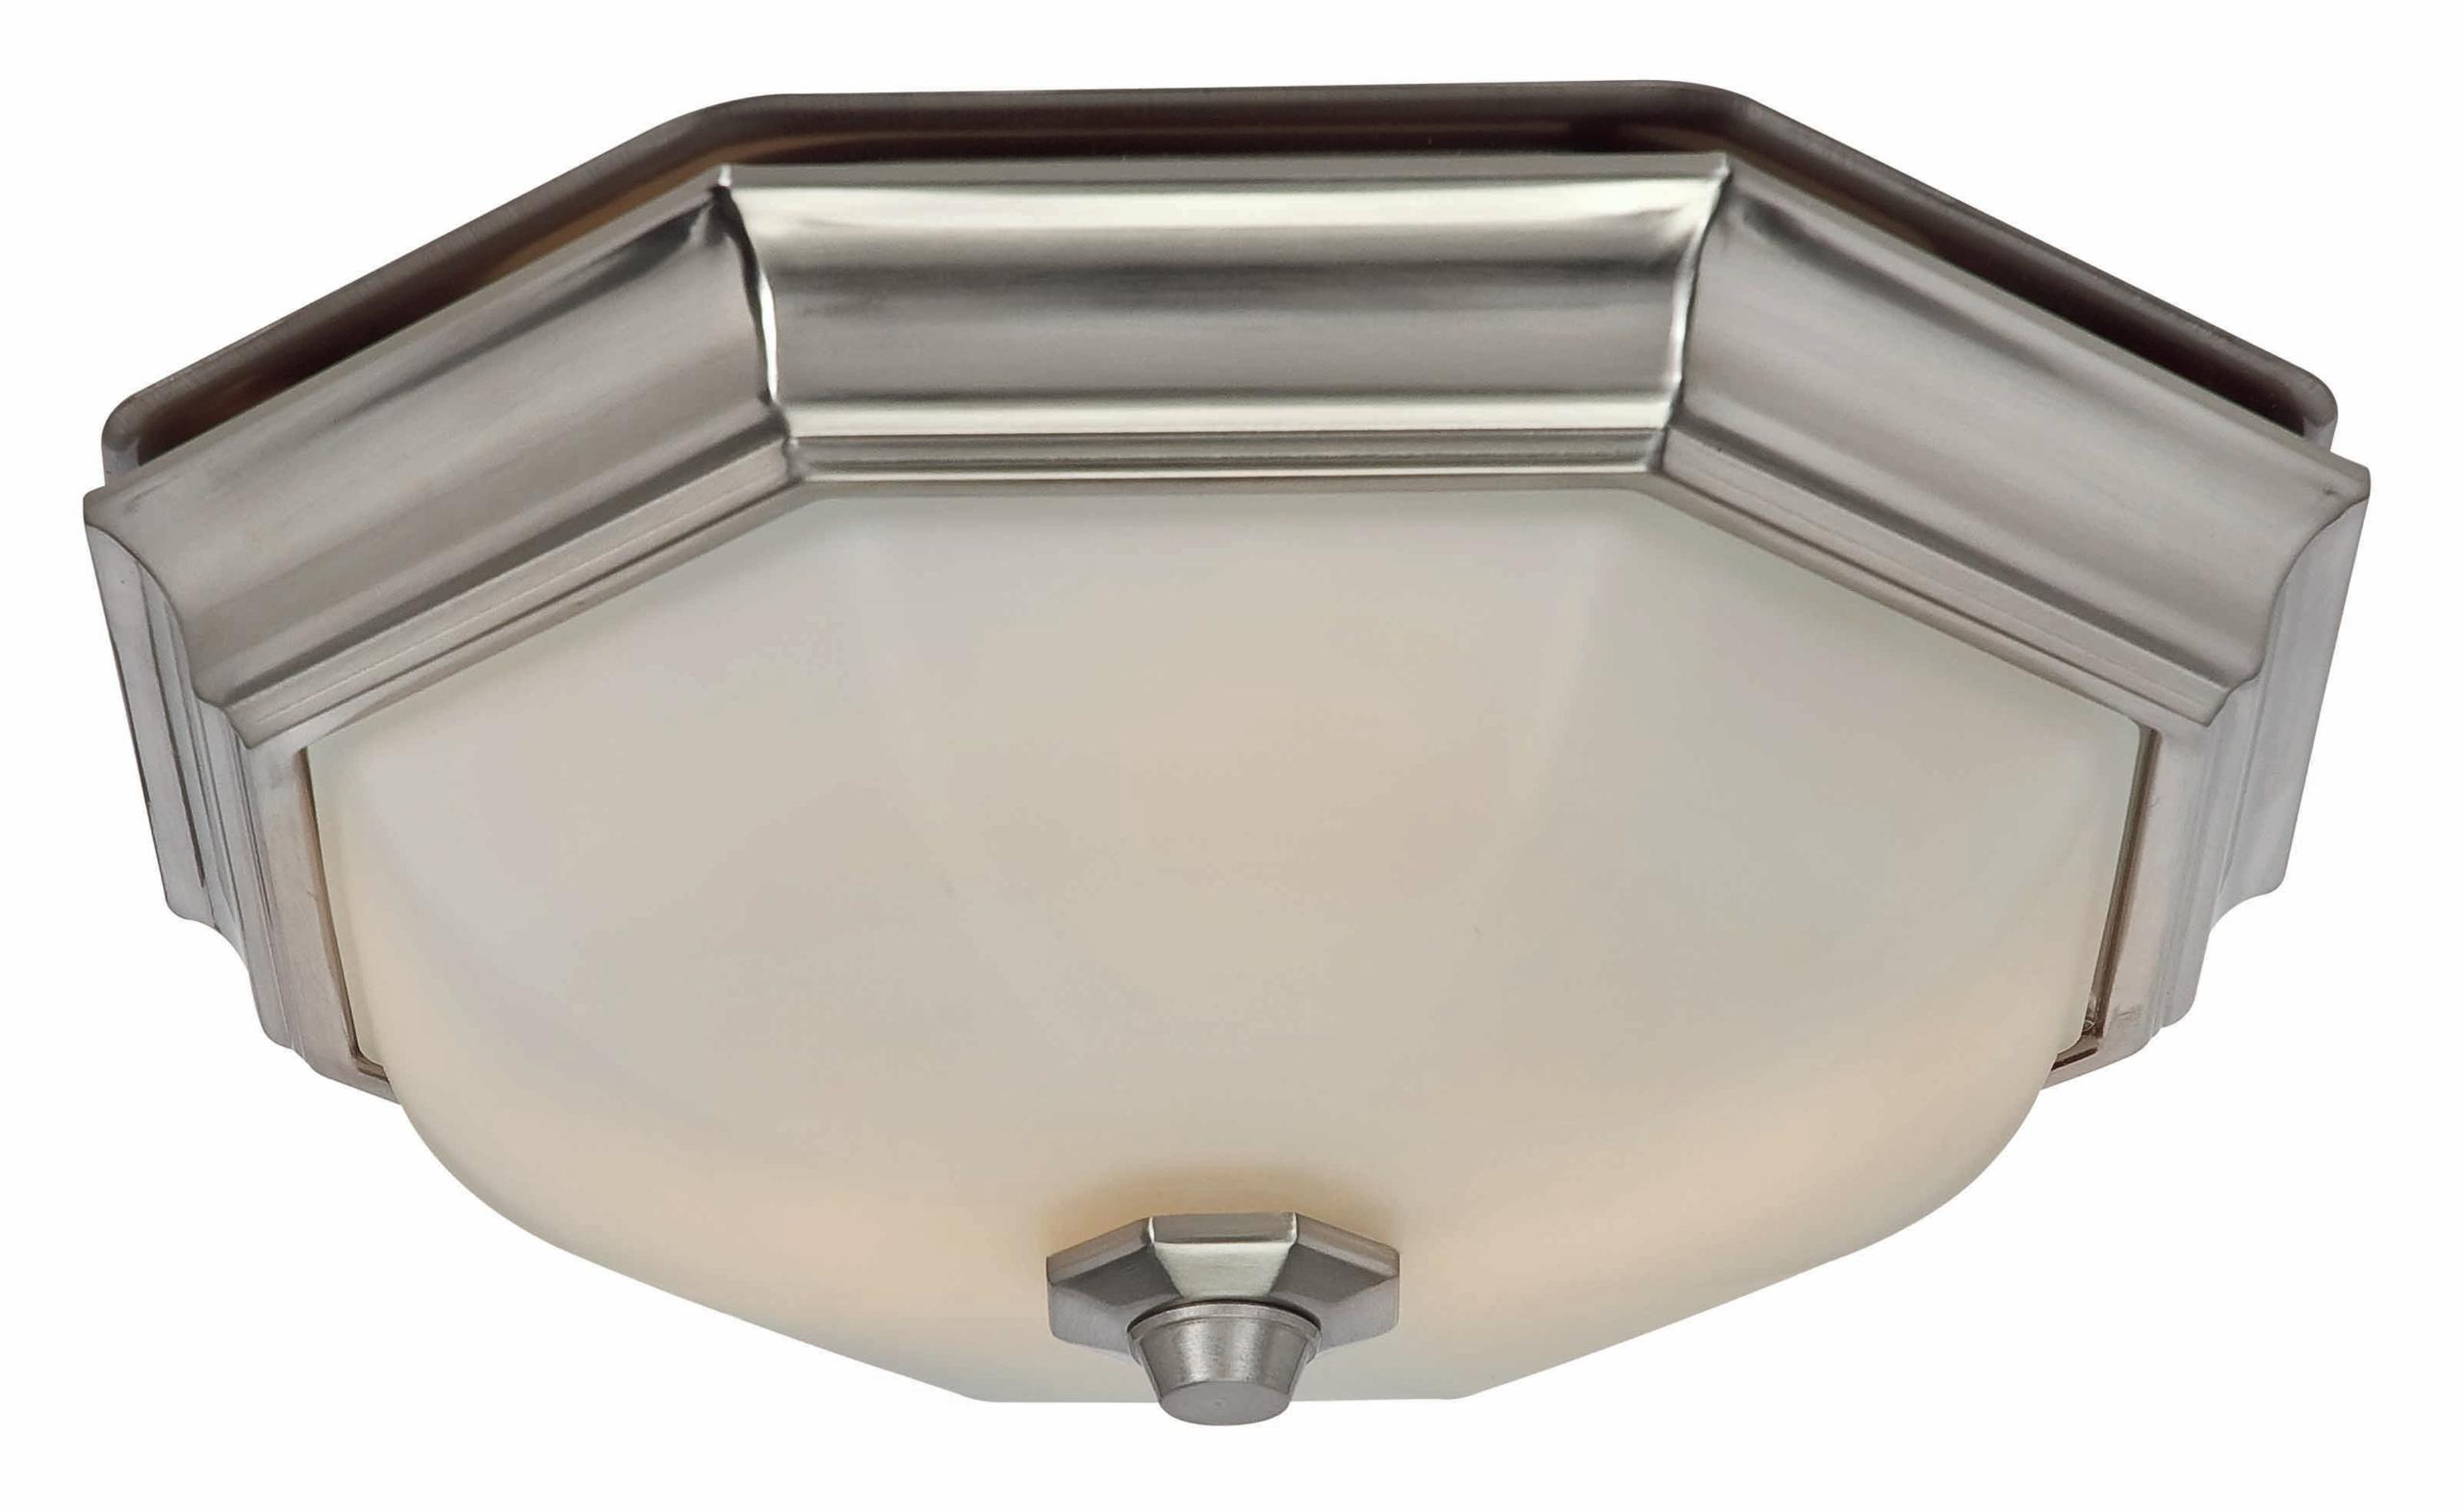 Decorative Bathroom Exhaust Fan With, Brushed Nickel Bathroom Exhaust Fan